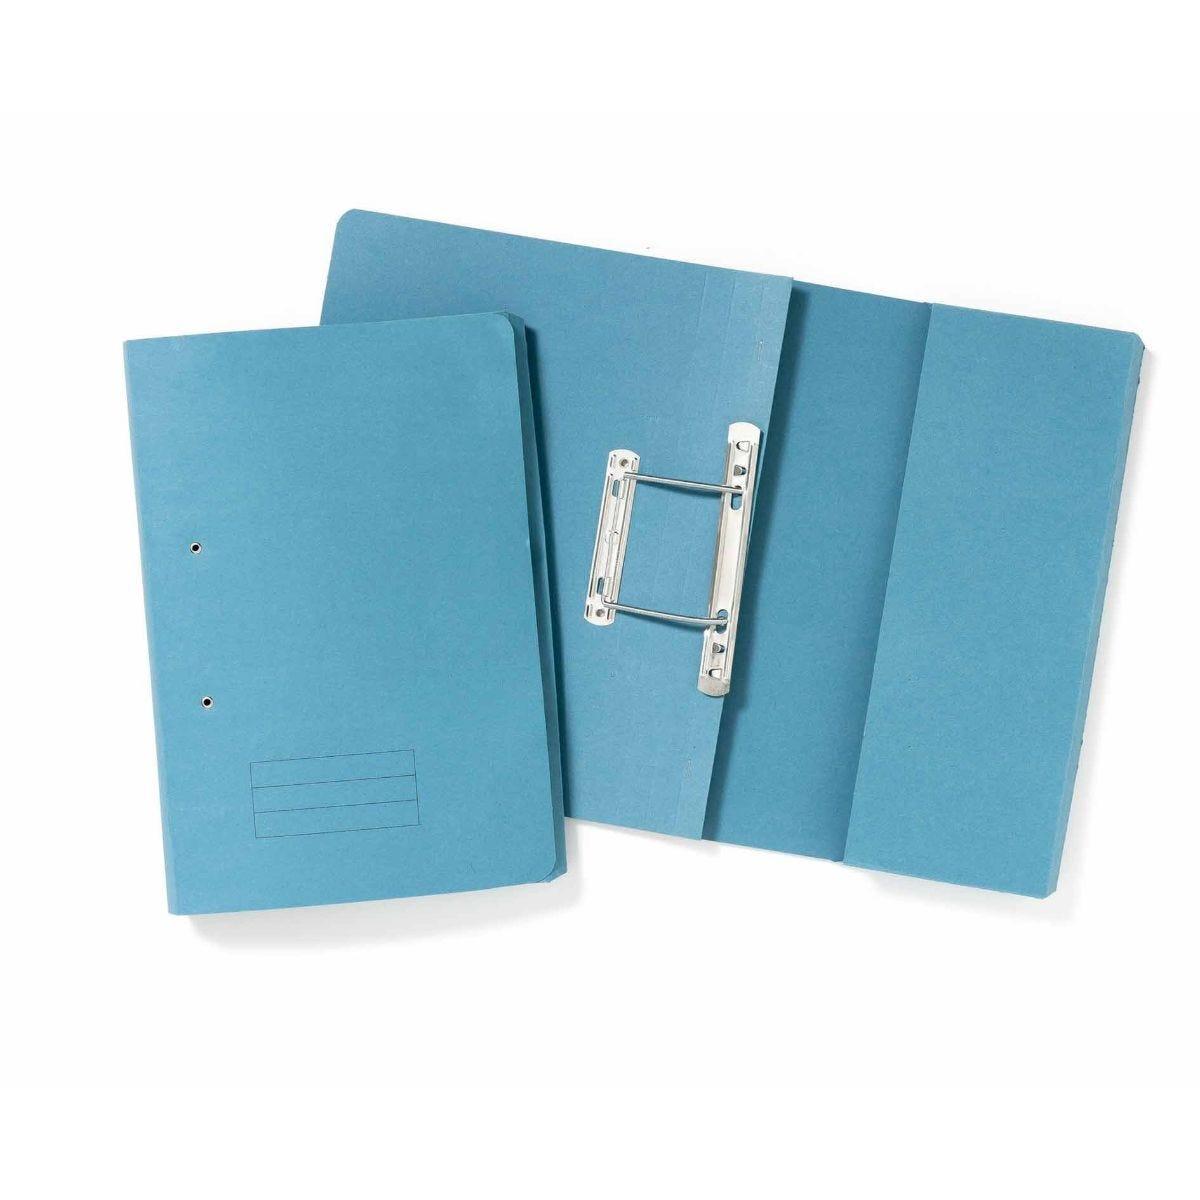 Exacompta Guildhall Pocket Spiral Files Foolscap Pack of 25 285gsm Blue